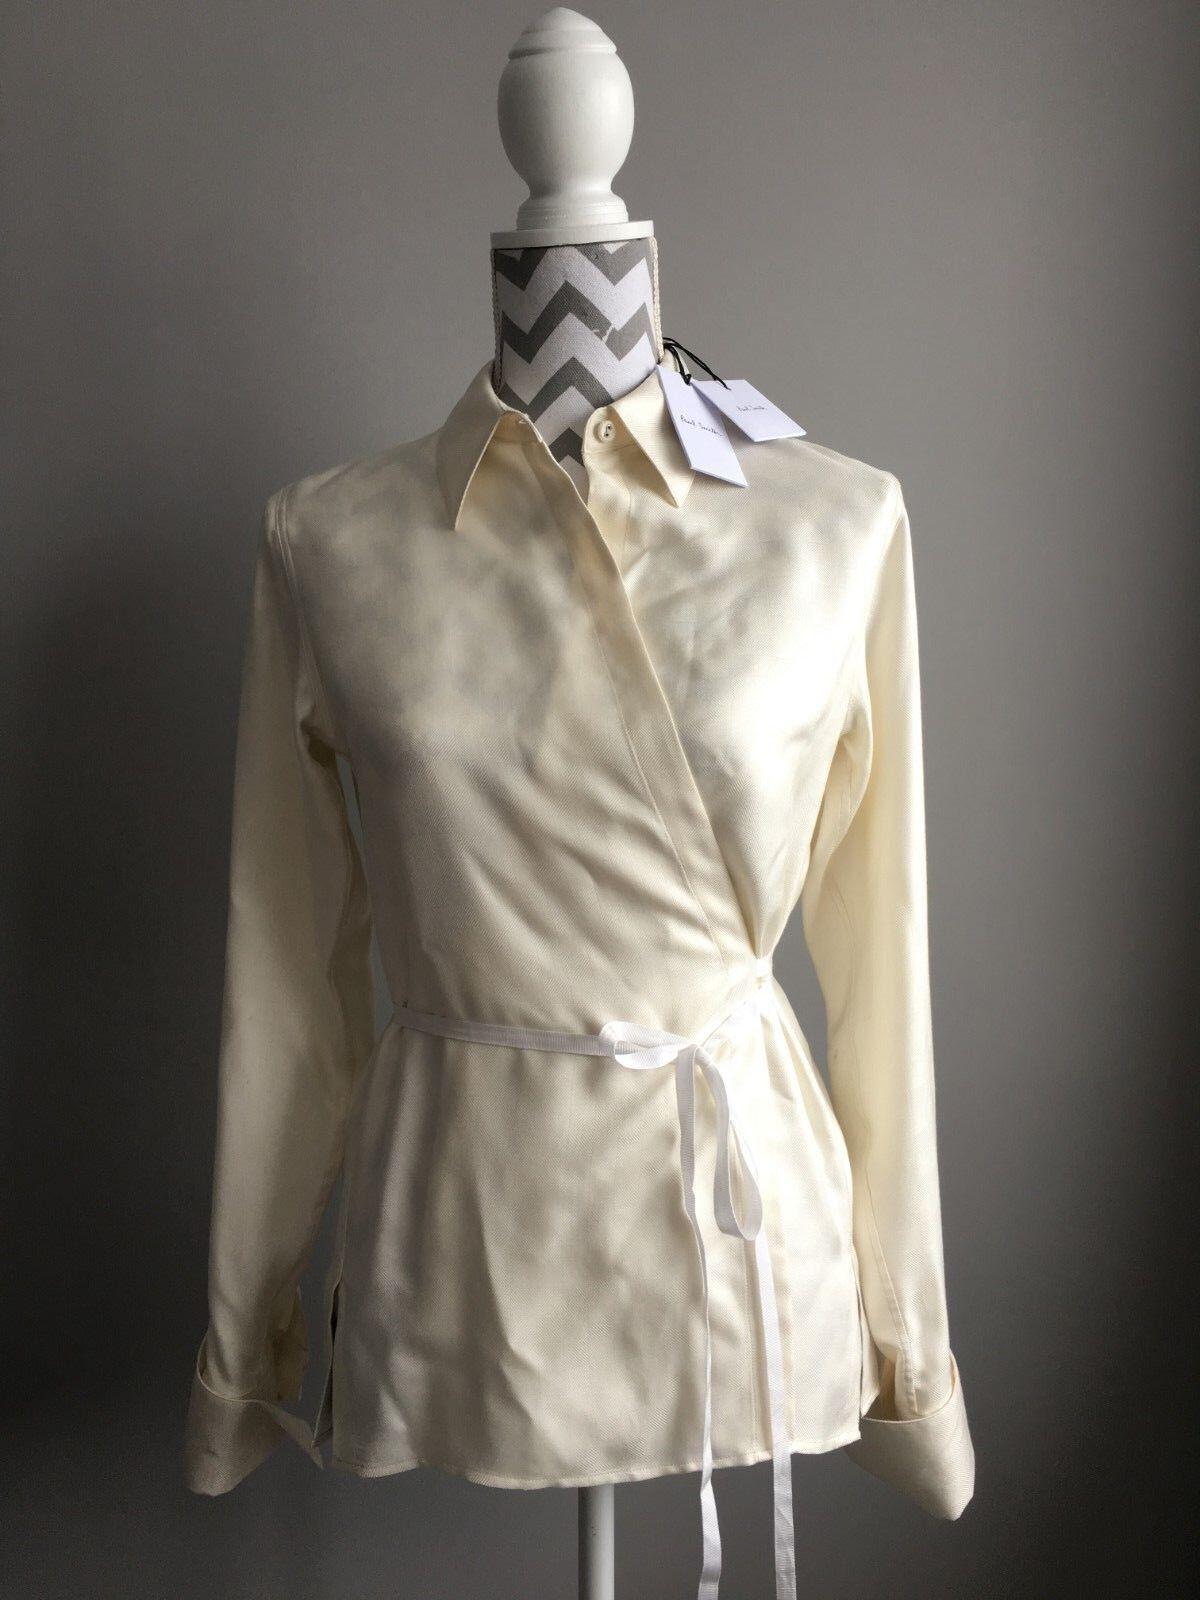 BNWT Damenschuhe Designer Paul Smith 100% silk cream wrap shirt 38